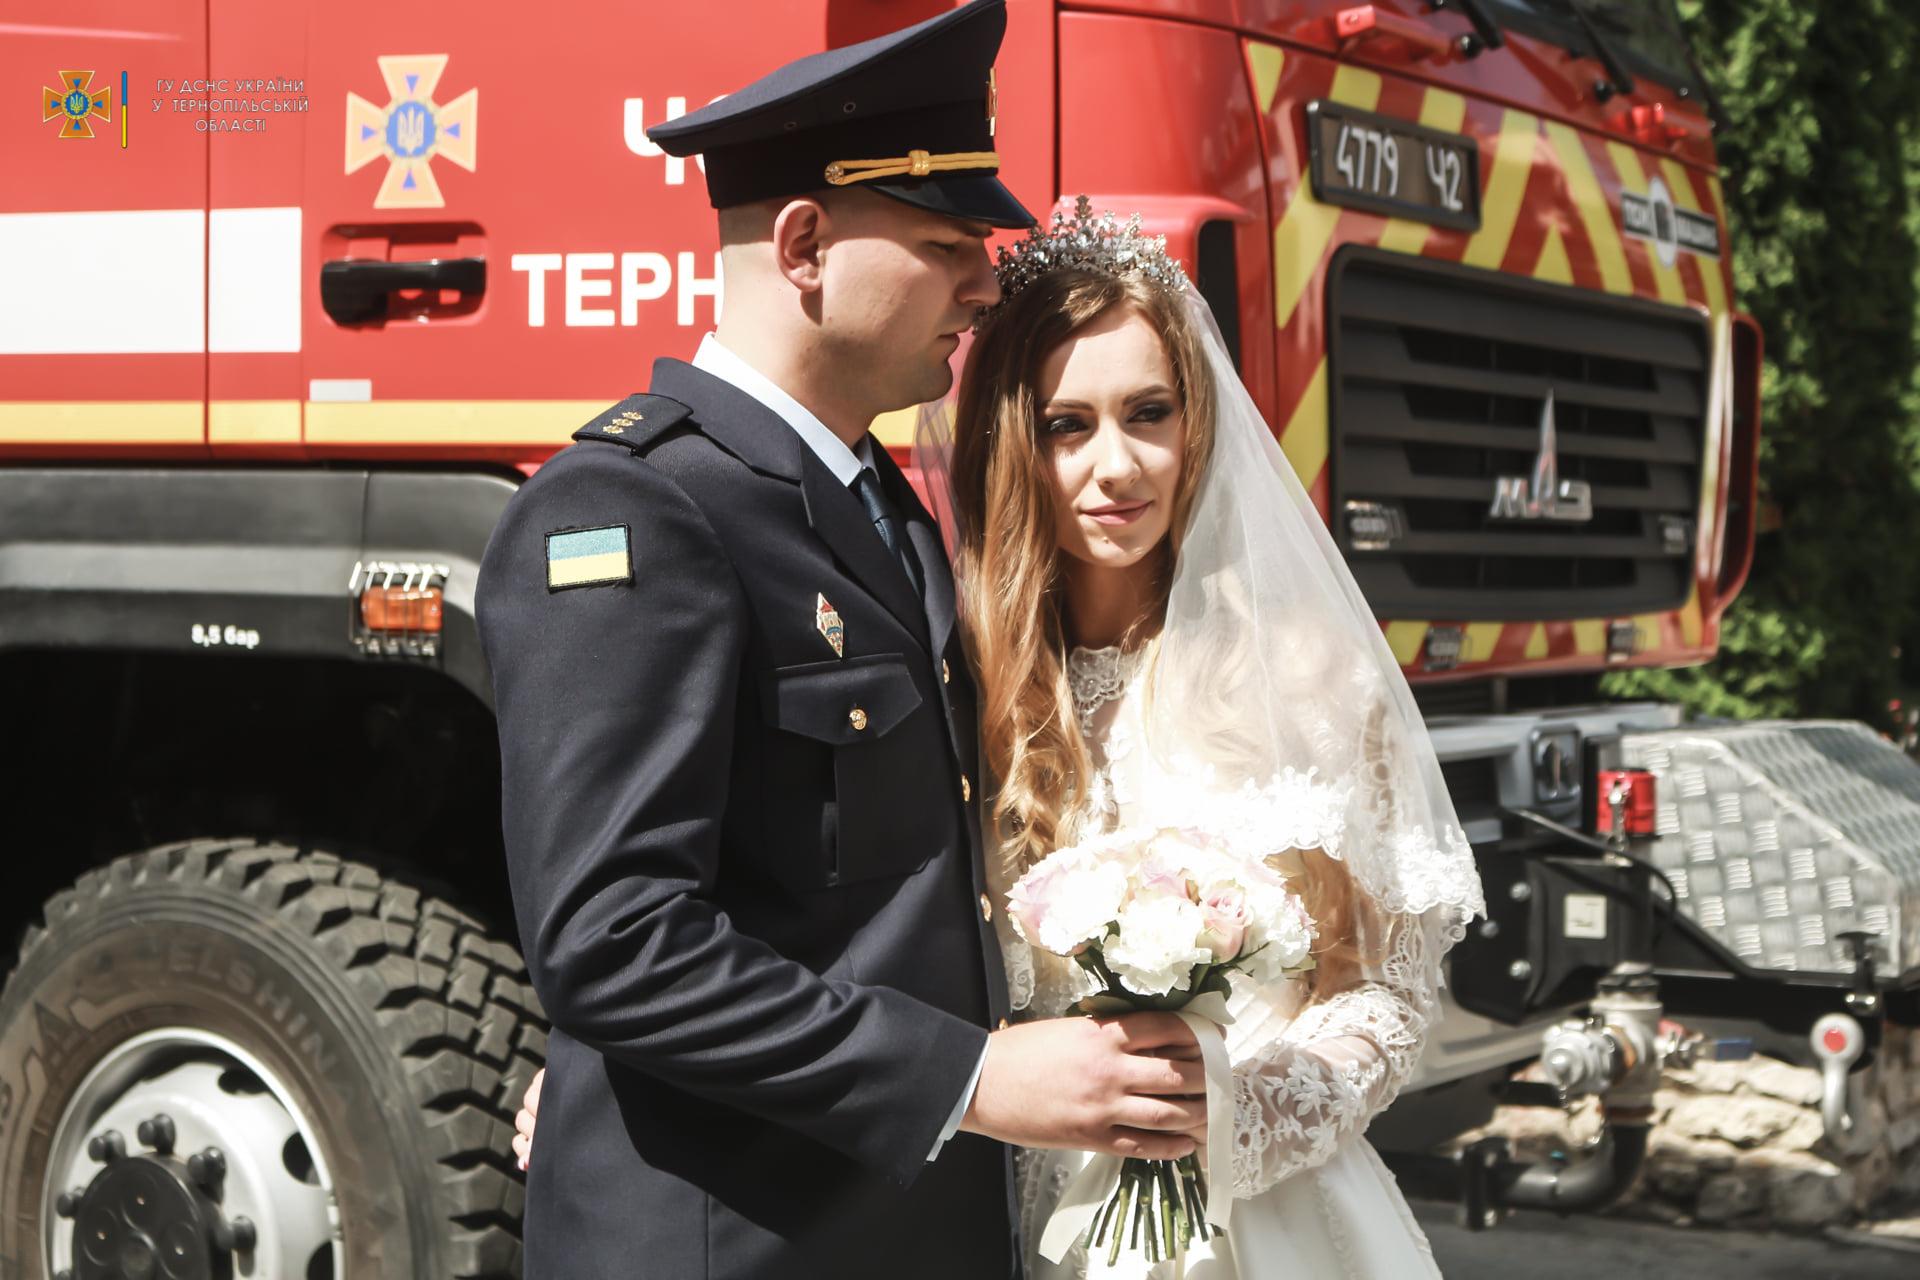 Пожежна машина, сирени та маячки: у Тернополі одружились рятувальники